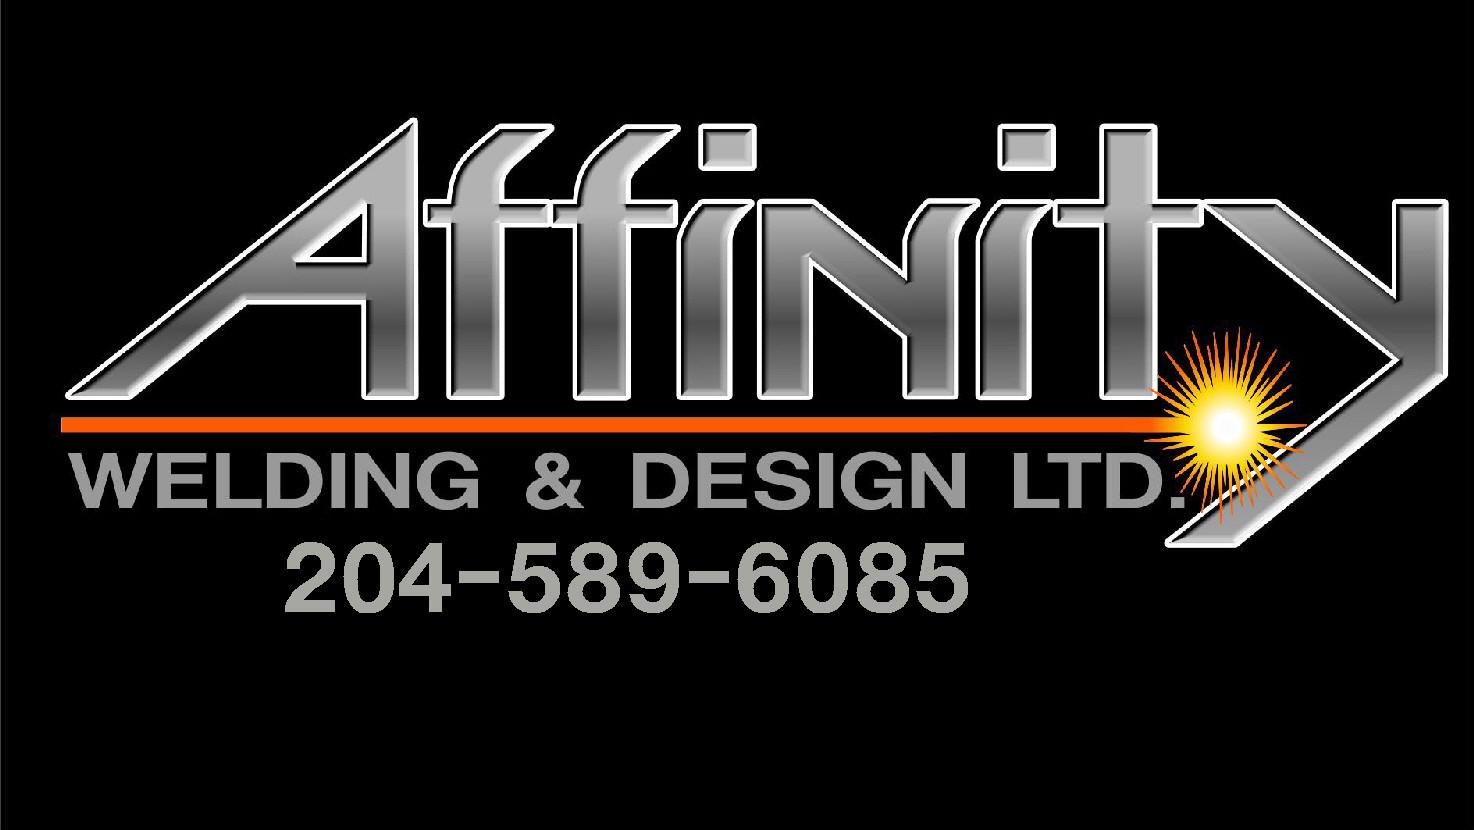 Employment Affinity Website